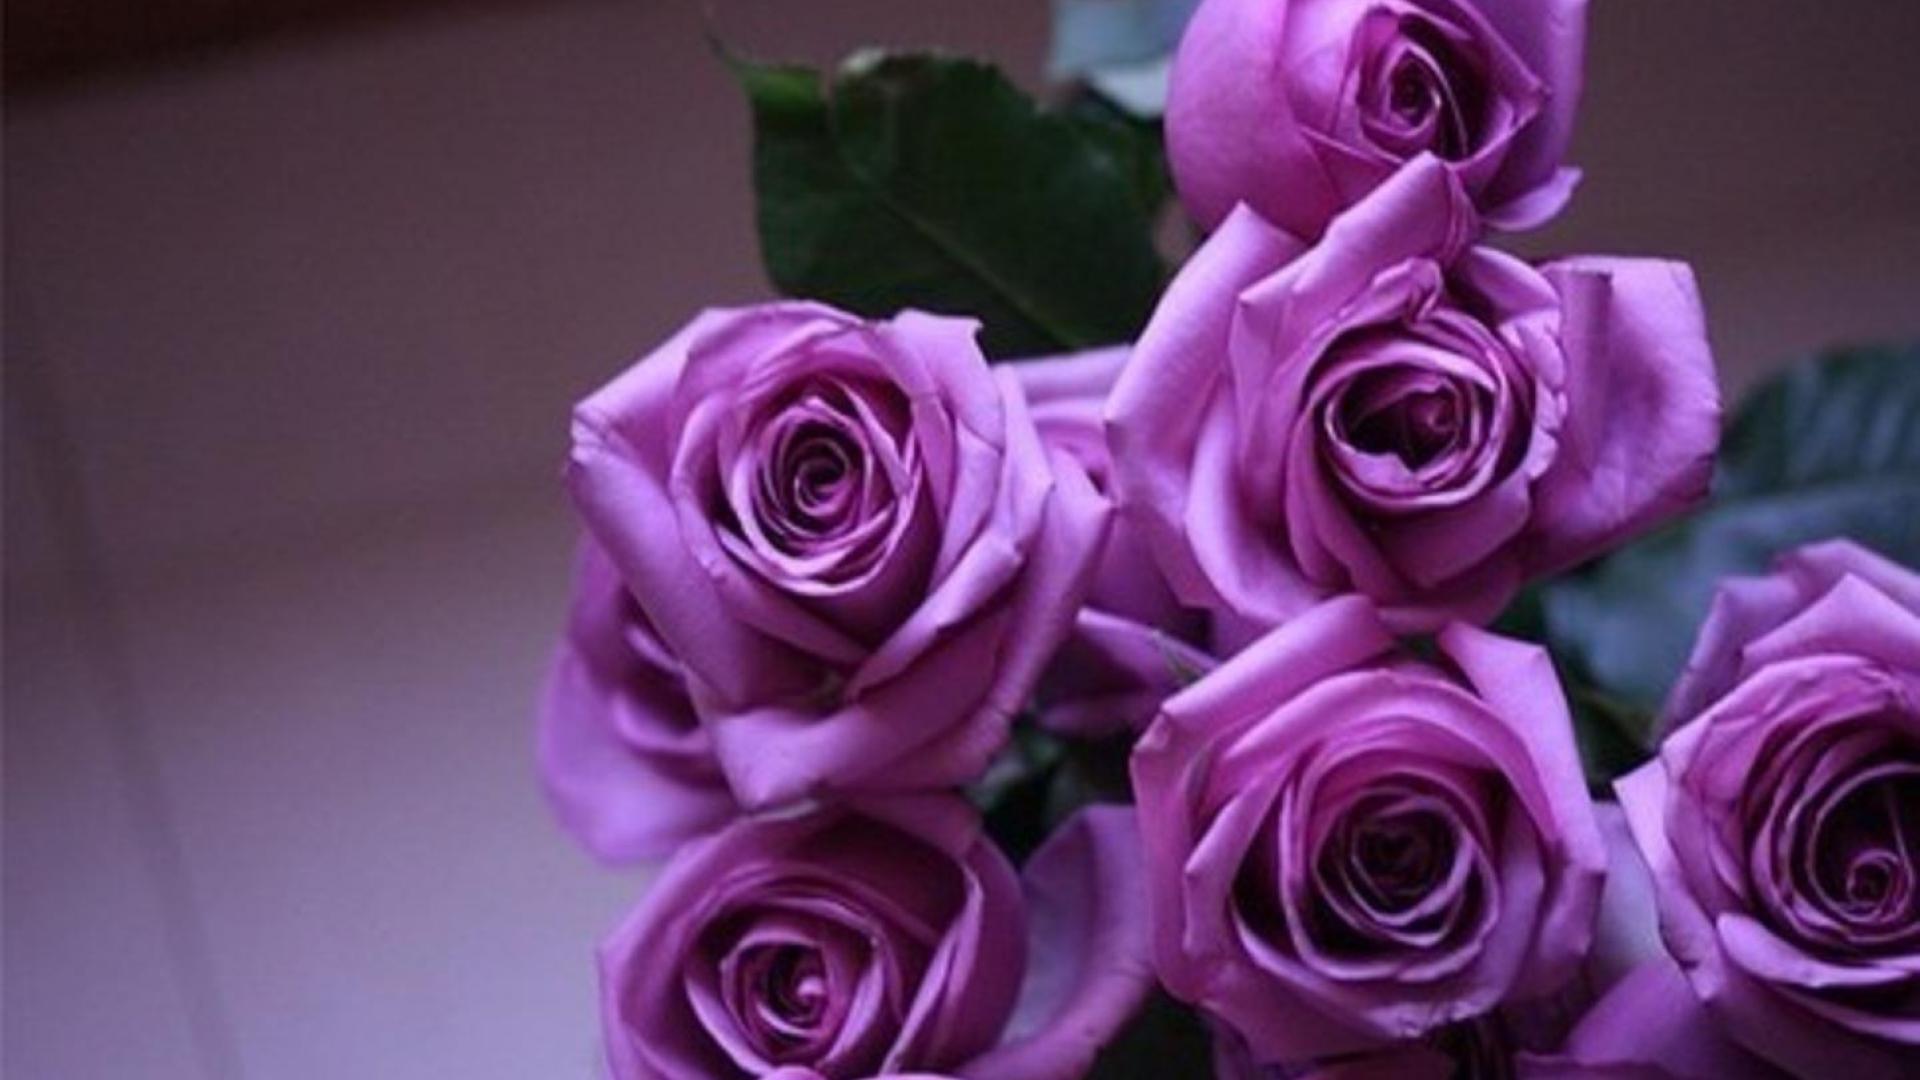 Res: 1920x1080, Purple Roses. Wallpaper: Purple Roses